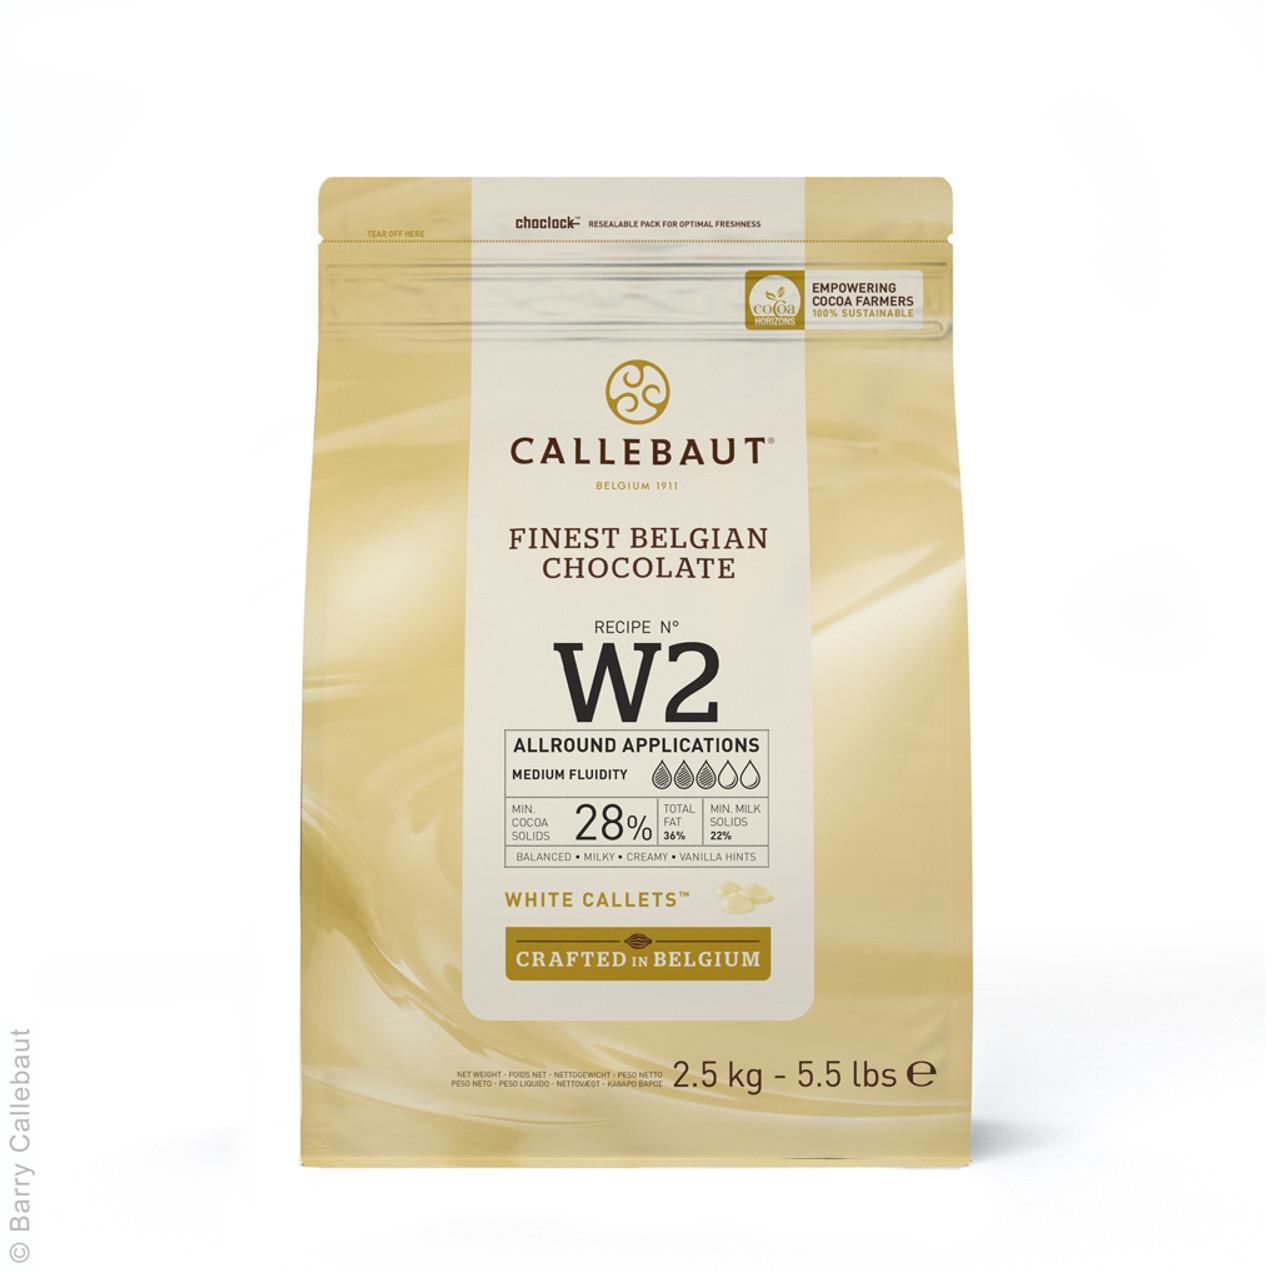 CALLEBAUT WHITE CALLETS 28% 2.5kg